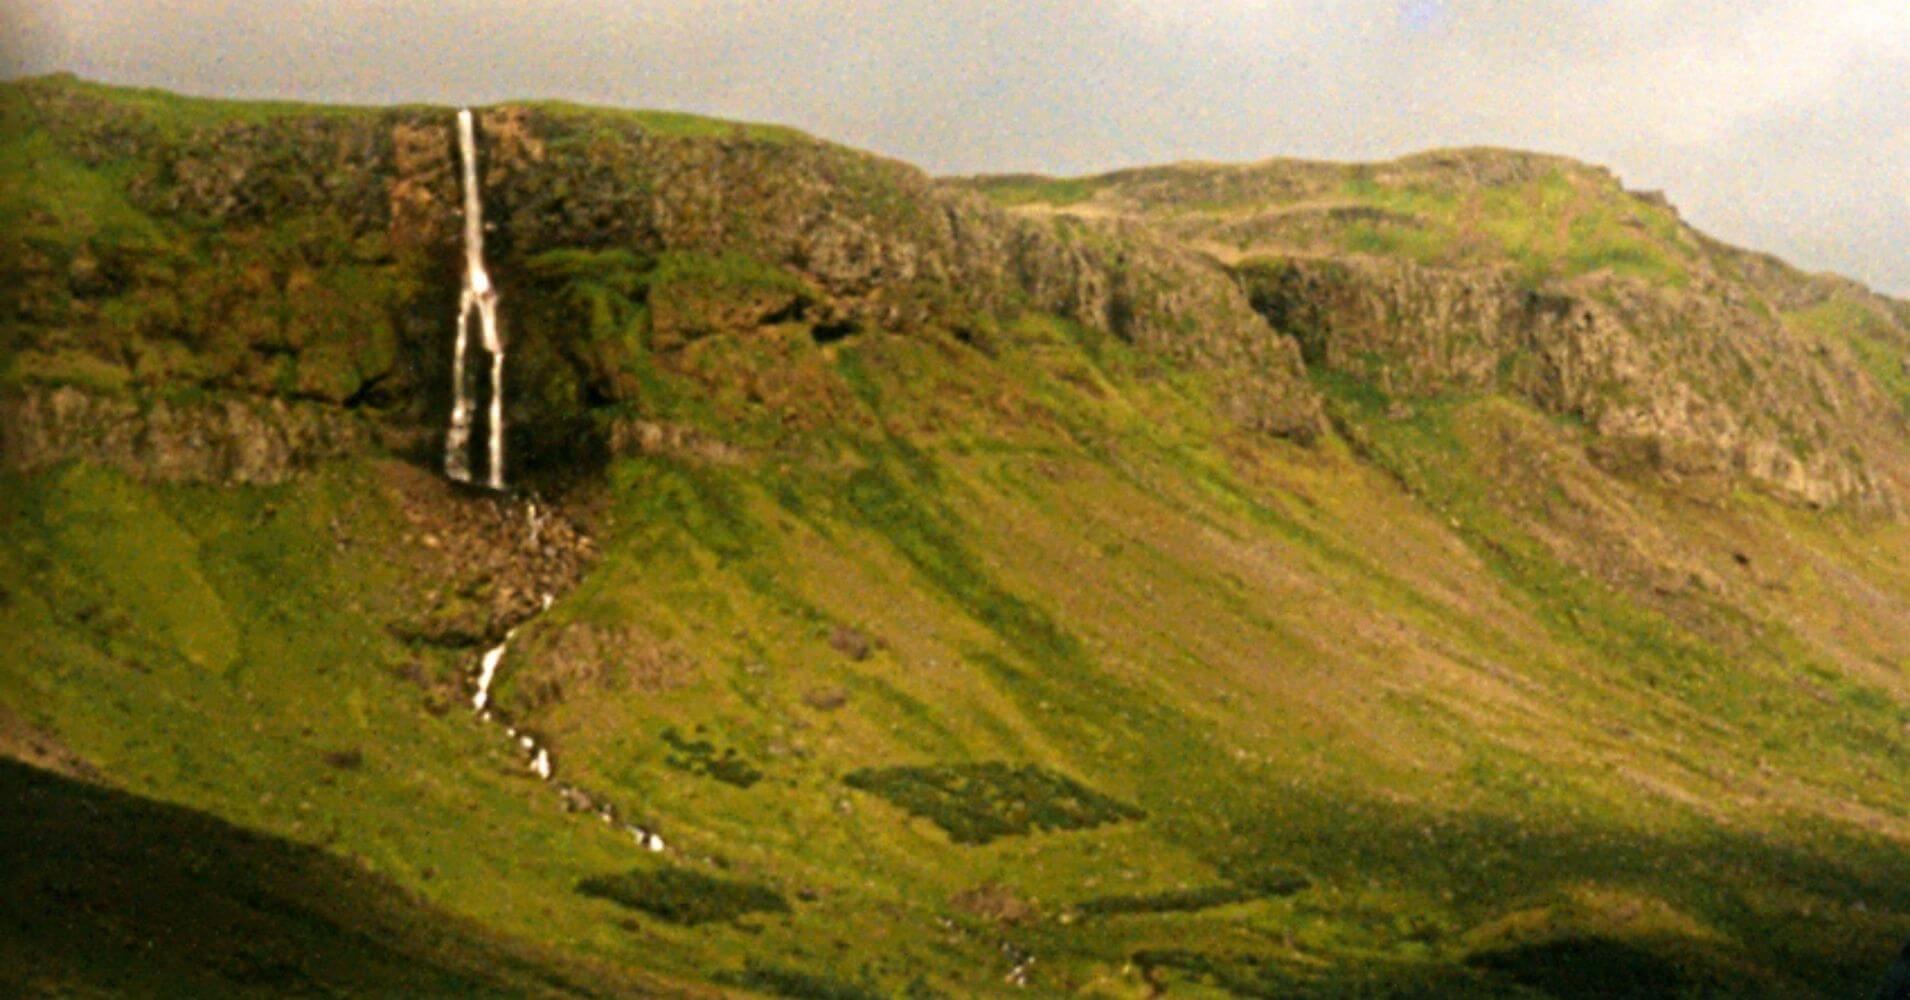 Cascada del Parque Nacional Snaefells Snæfellsjökull. Vesturland, Islandia.